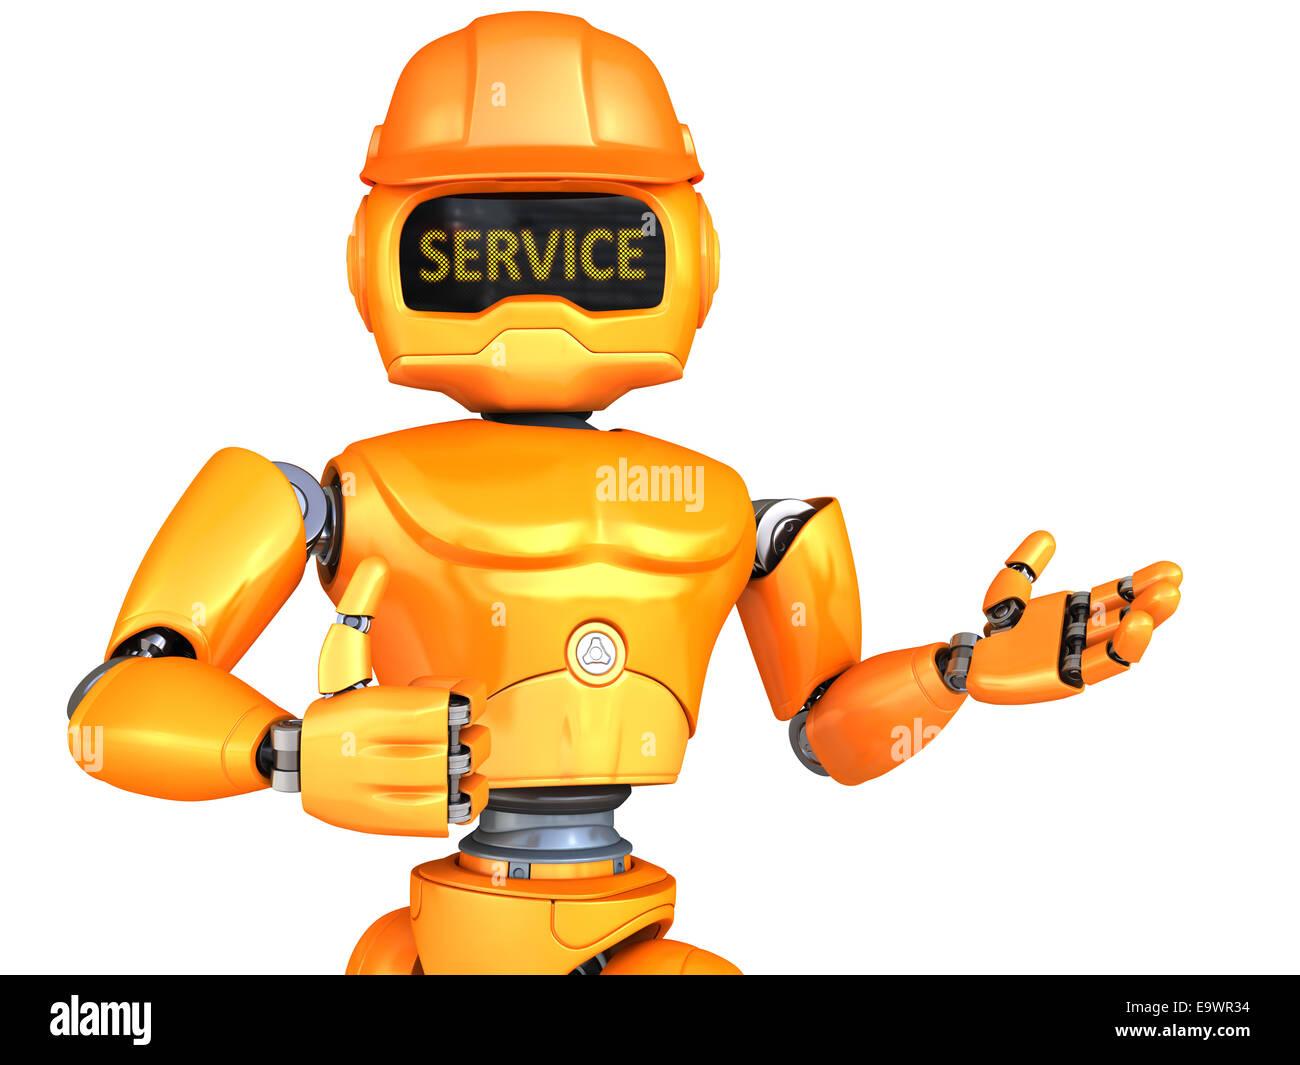 Robot-repairman - Stock Image